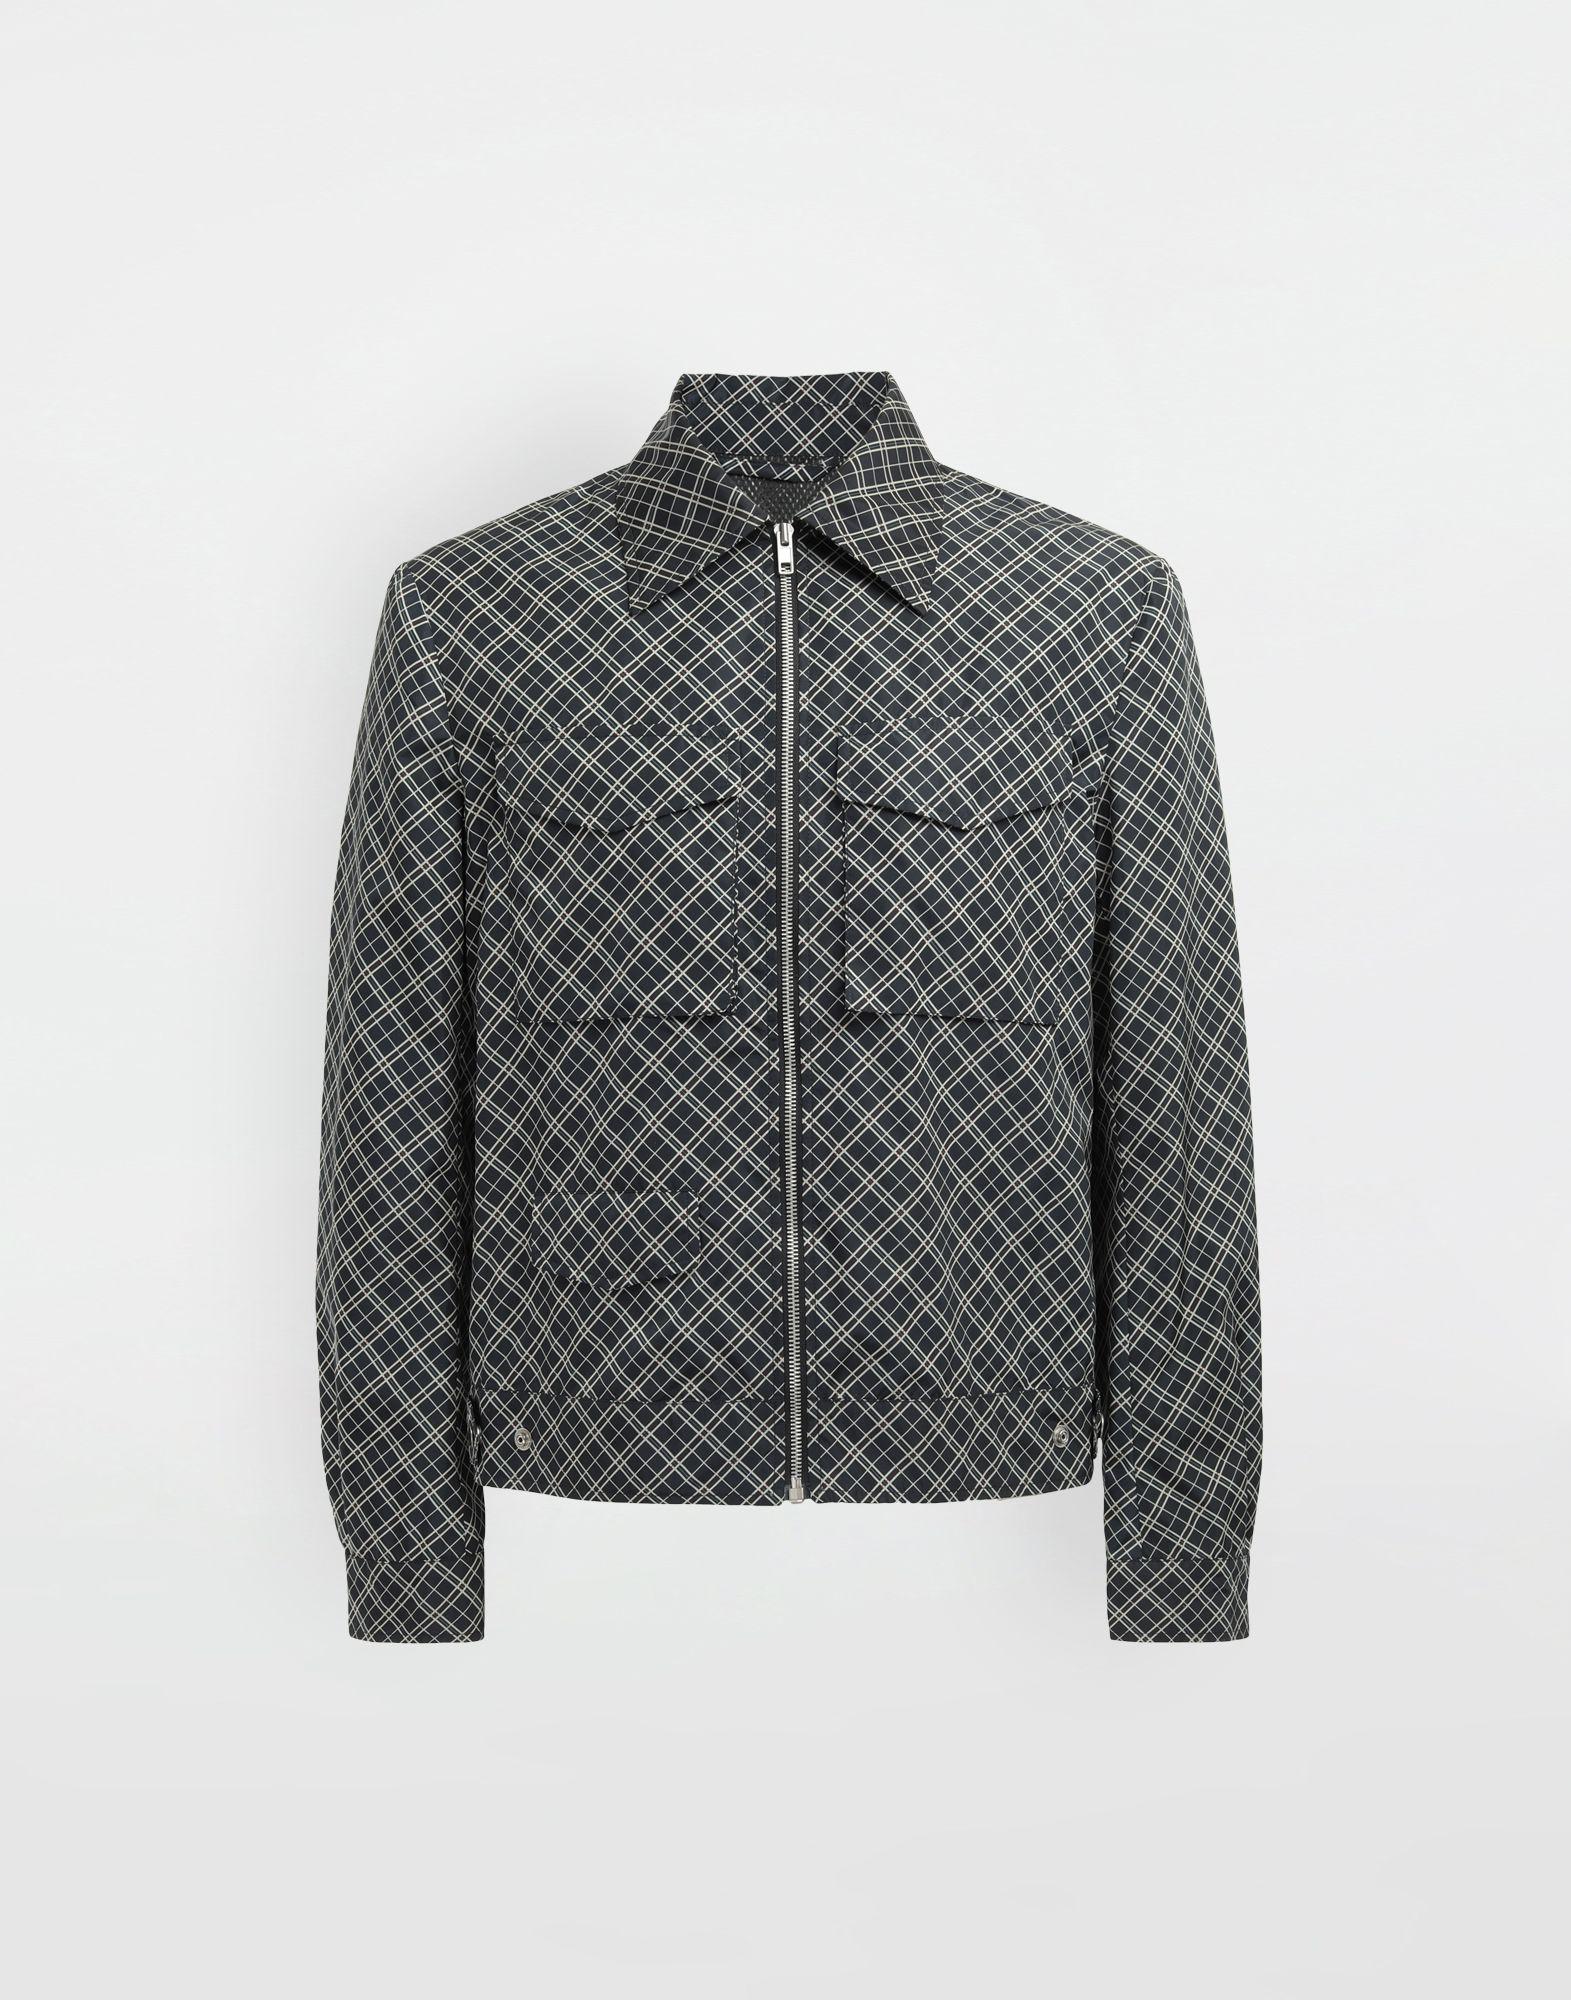 MAISON MARGIELA Checked sports jacket Coats and Trenches Man f